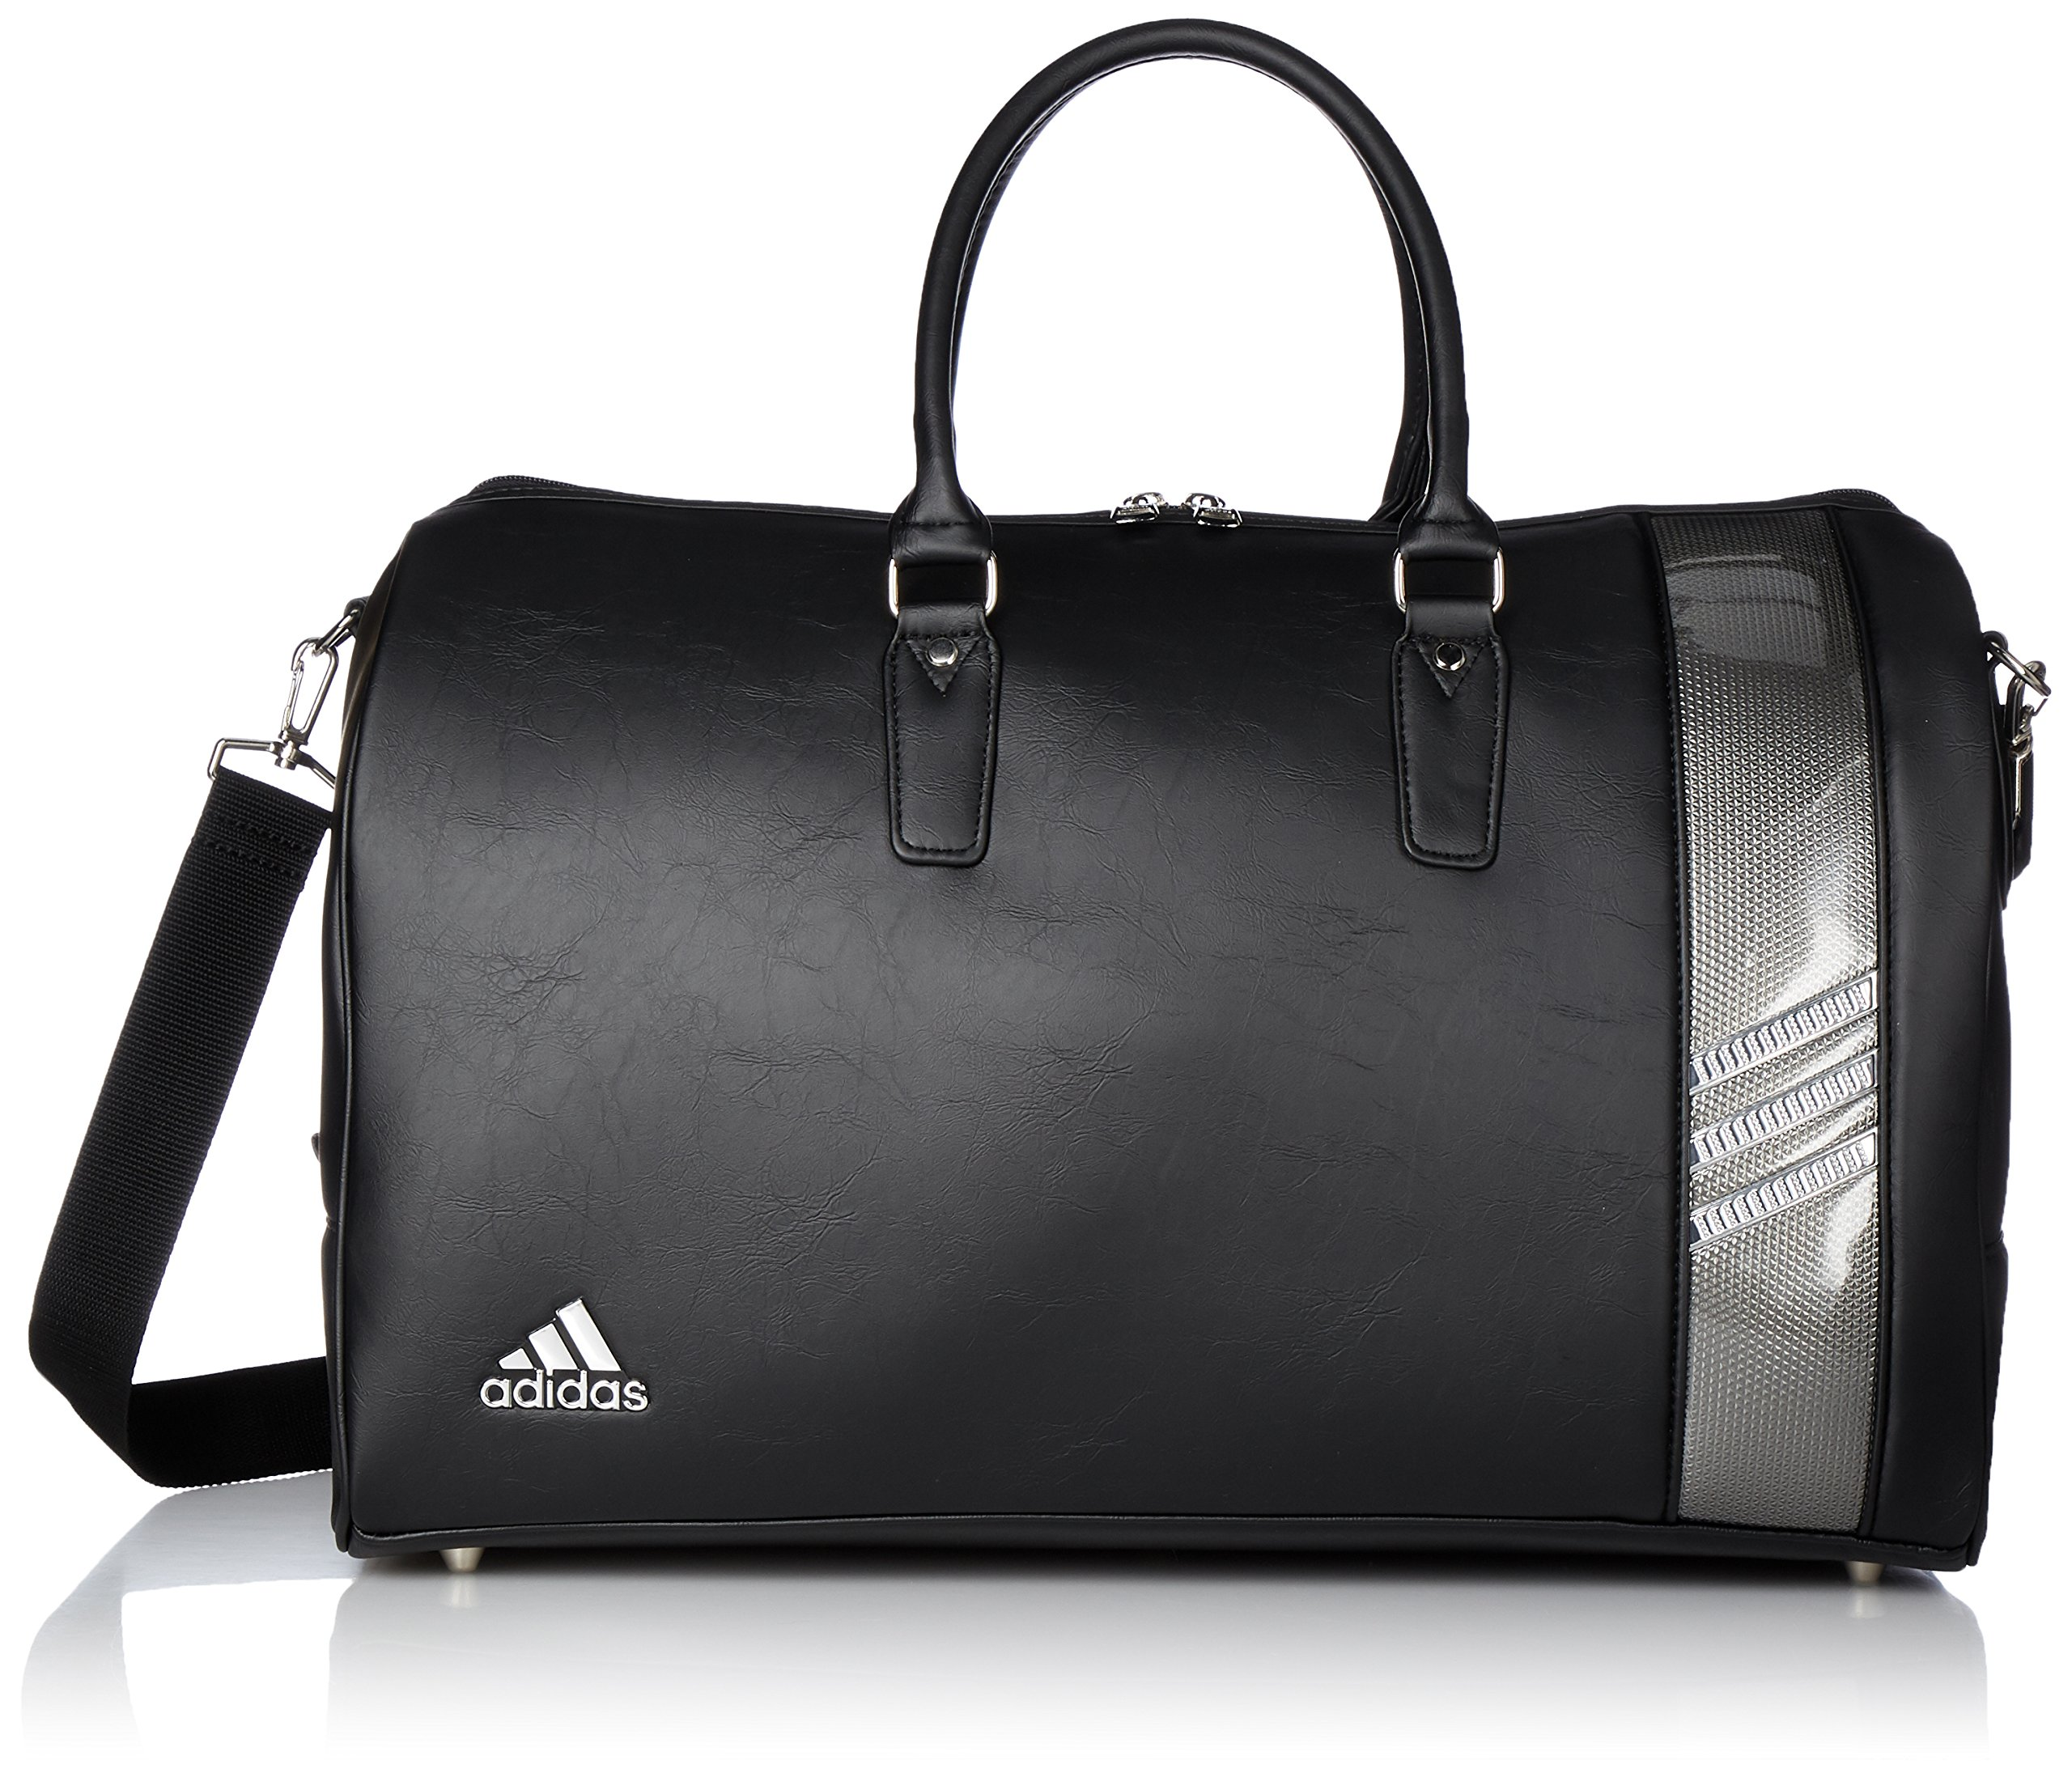 [Adidas Golf] Boston bag L50 × W24 × H 31 cm / with shoes in pocket / AWT 82 A92345 black